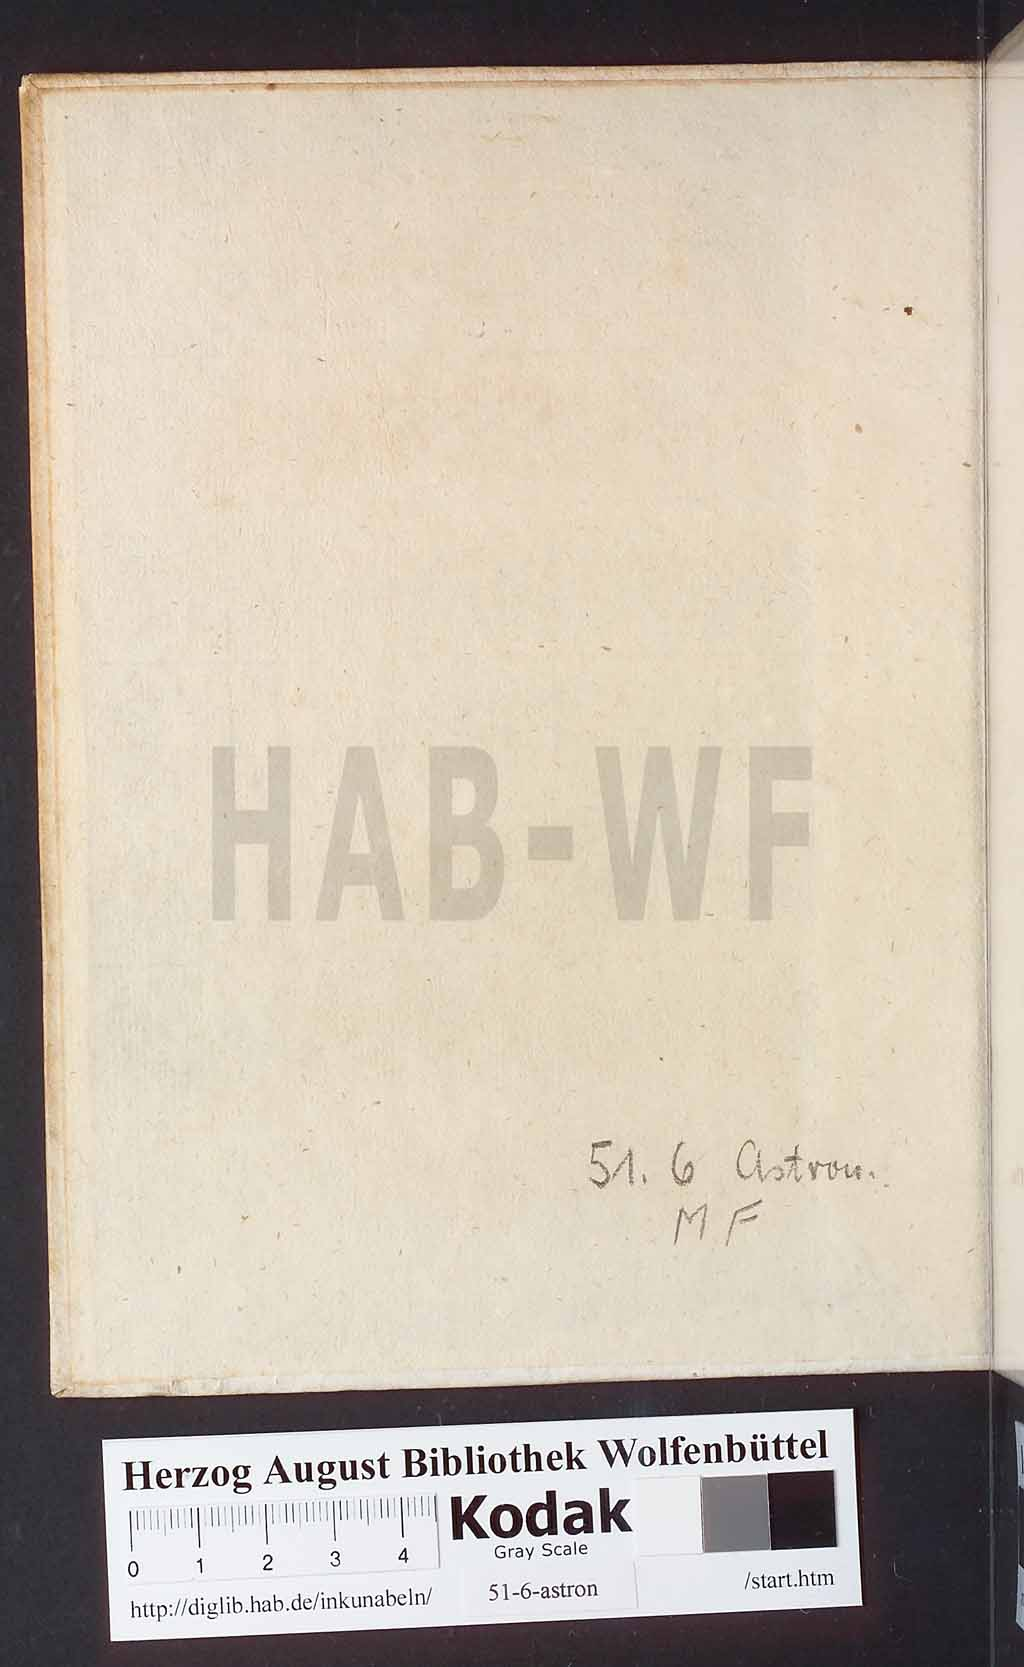 http://diglib.hab.de/inkunabeln/51-6-astron/00002.jpg